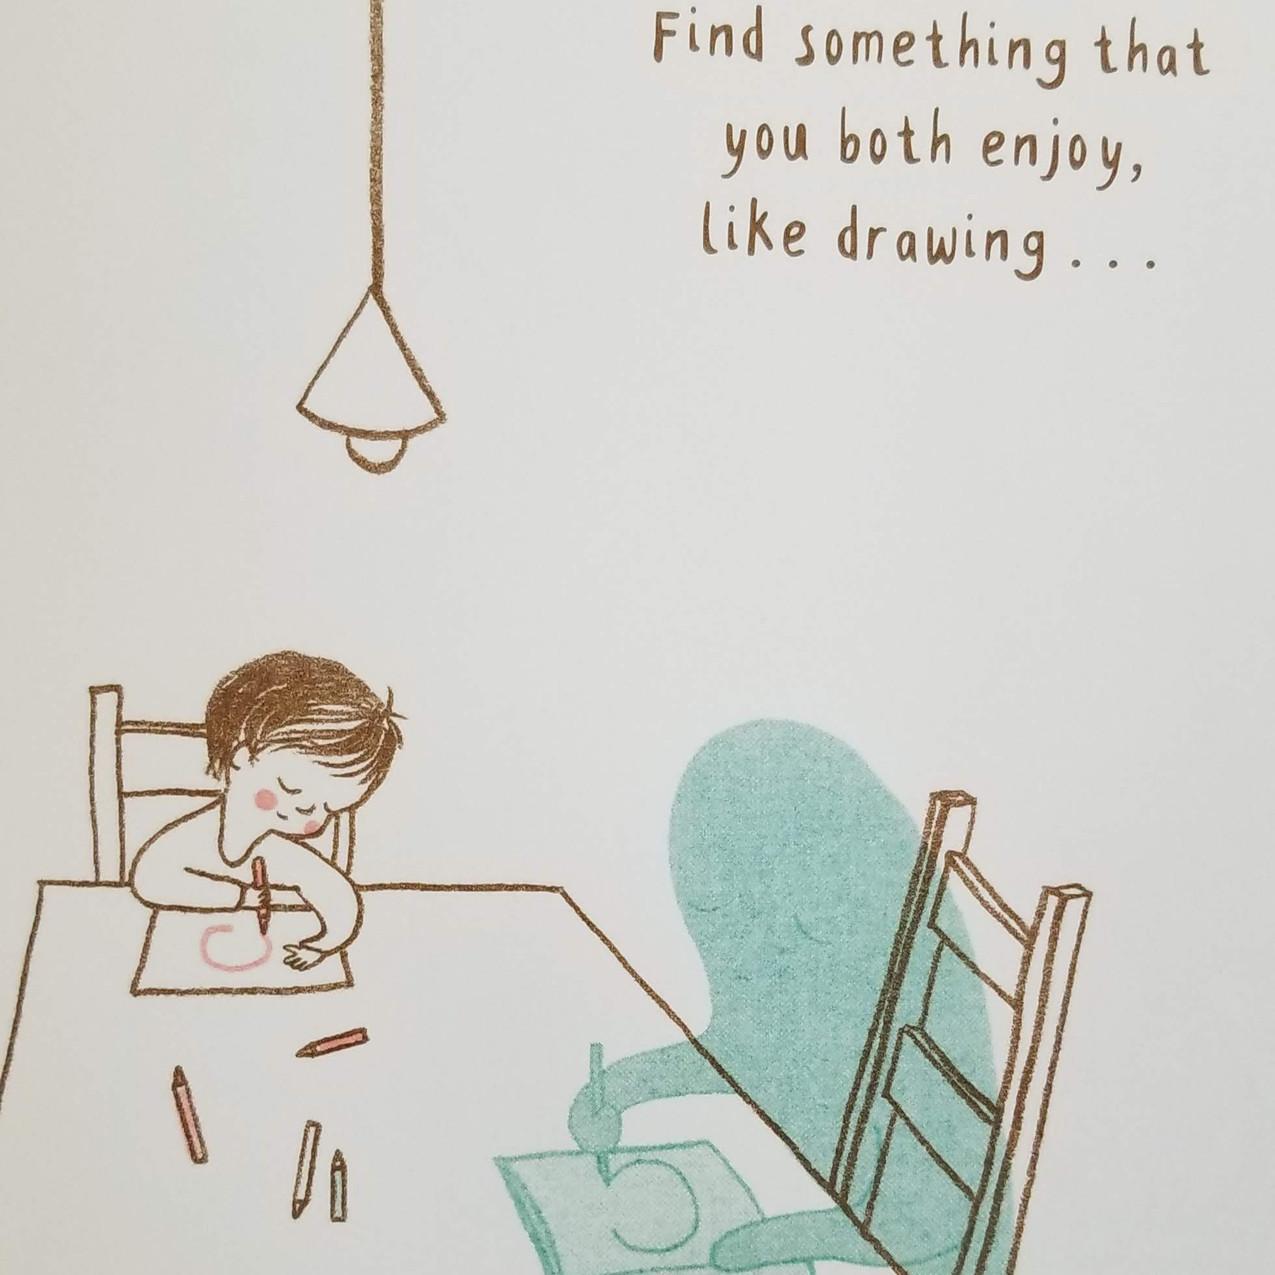 Do something together.